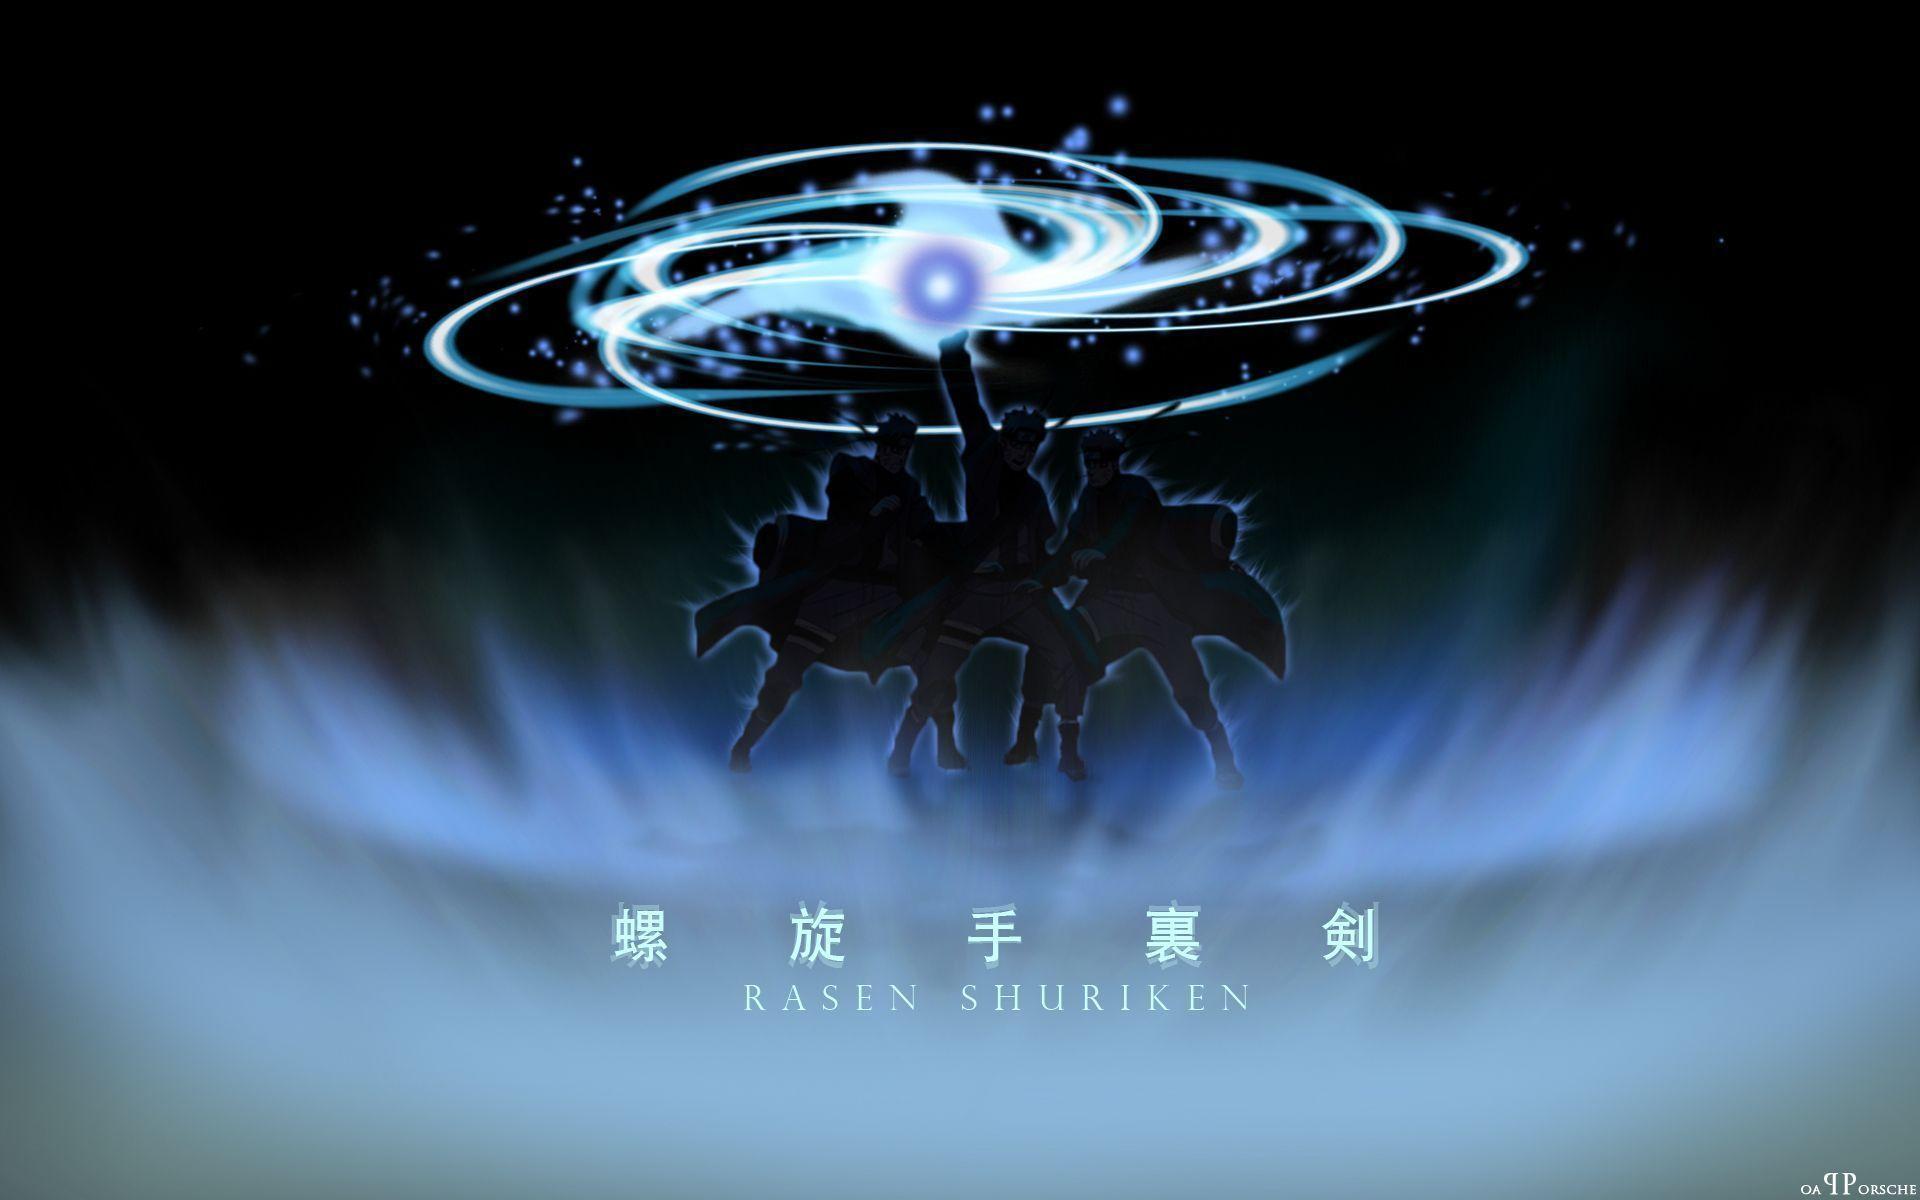 Naruto Sennin Wallpaper Hd For Android Hd - WallpaperZ